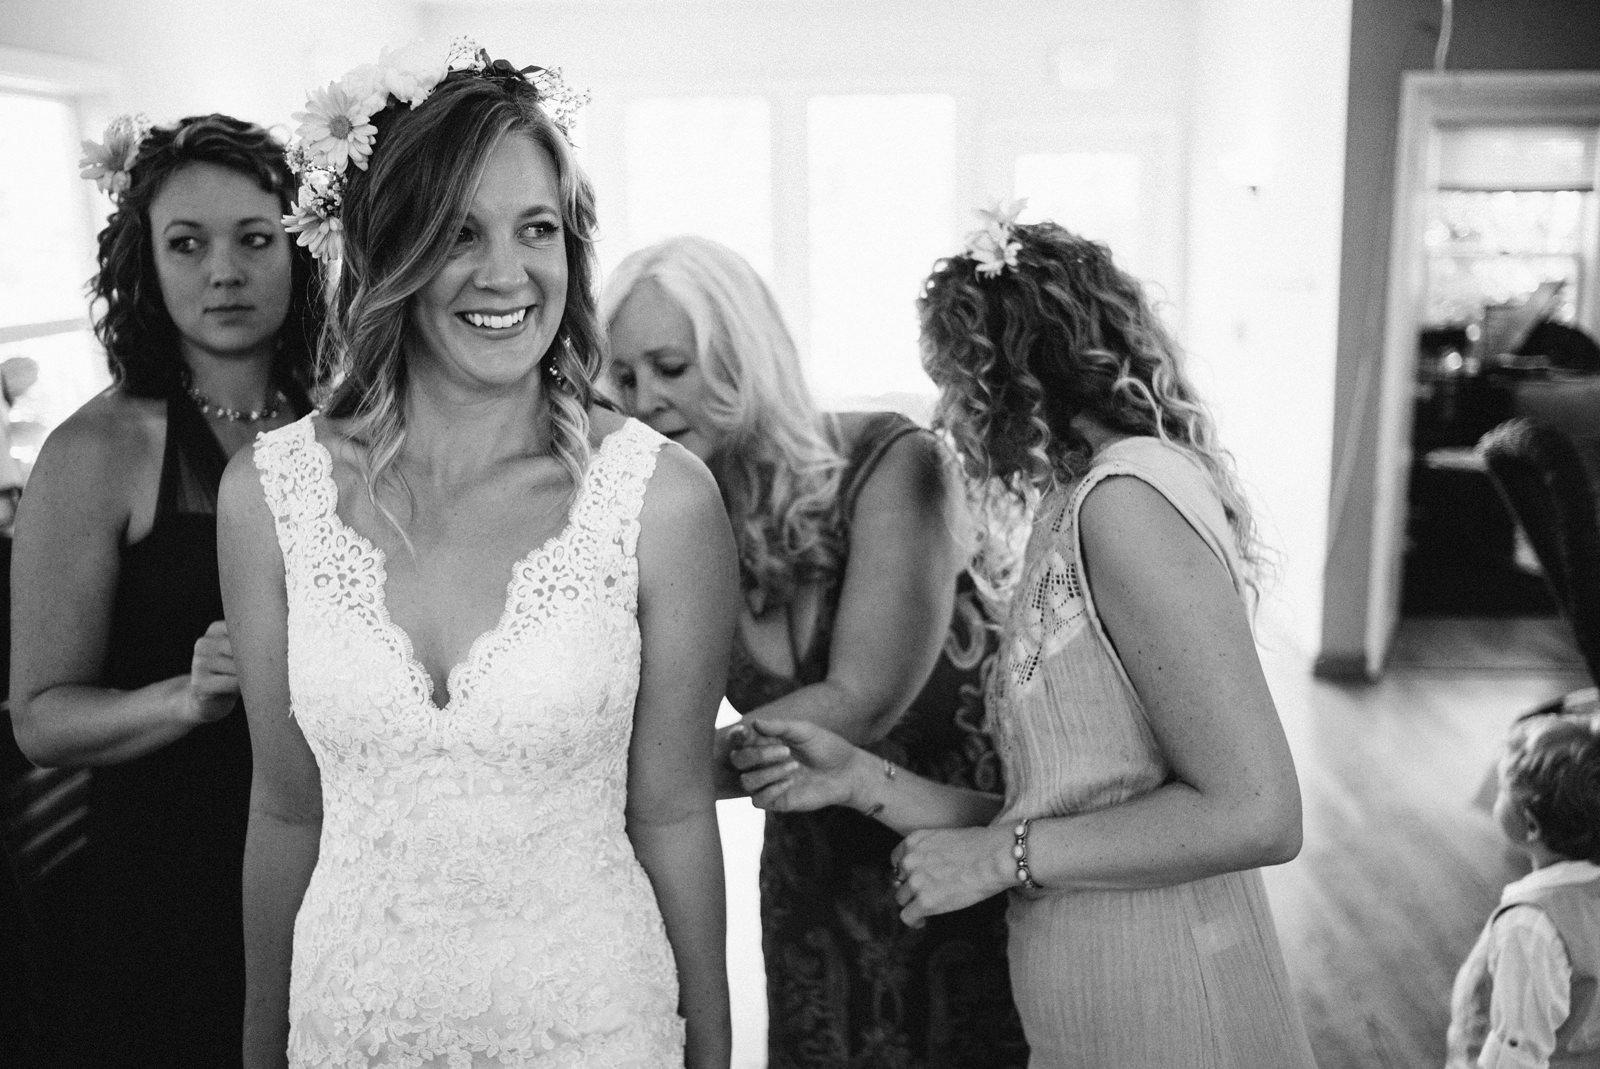 rivers-bend-retreat-wedding-008 RIVER'S BEND RETREAT WEDDING